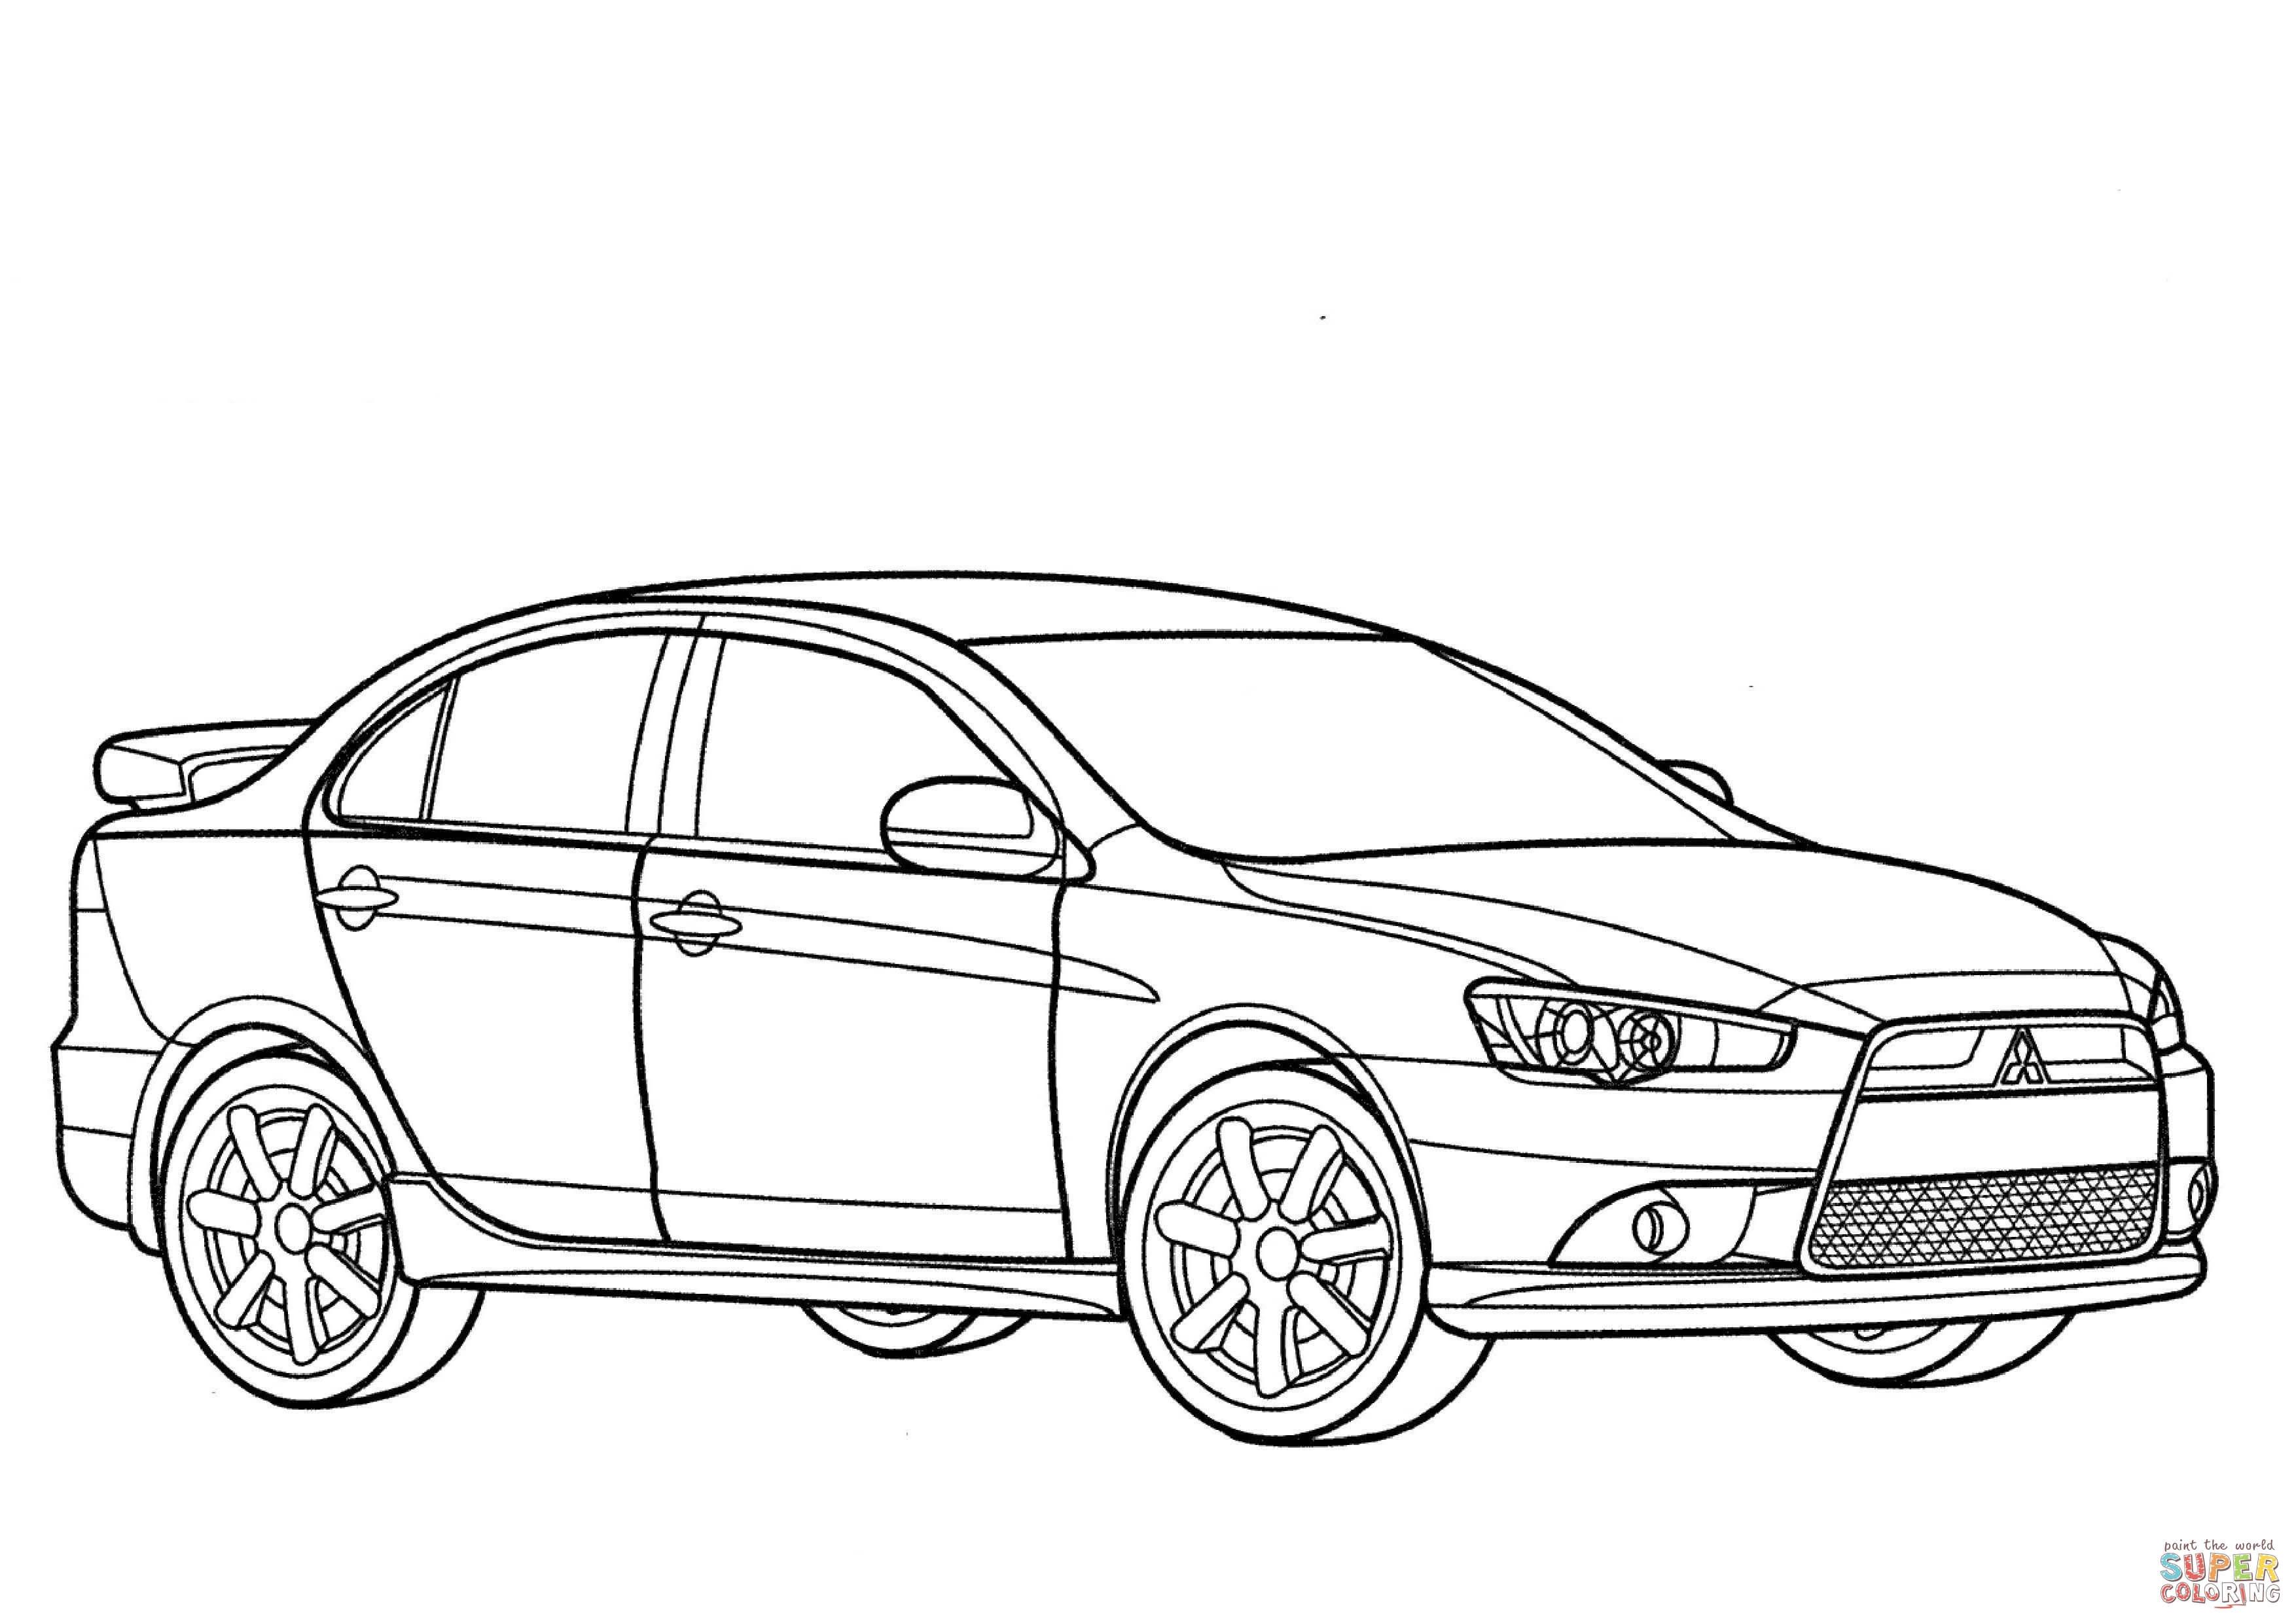 Desenho de Mitsubishi Lancer Ralliart para colorir